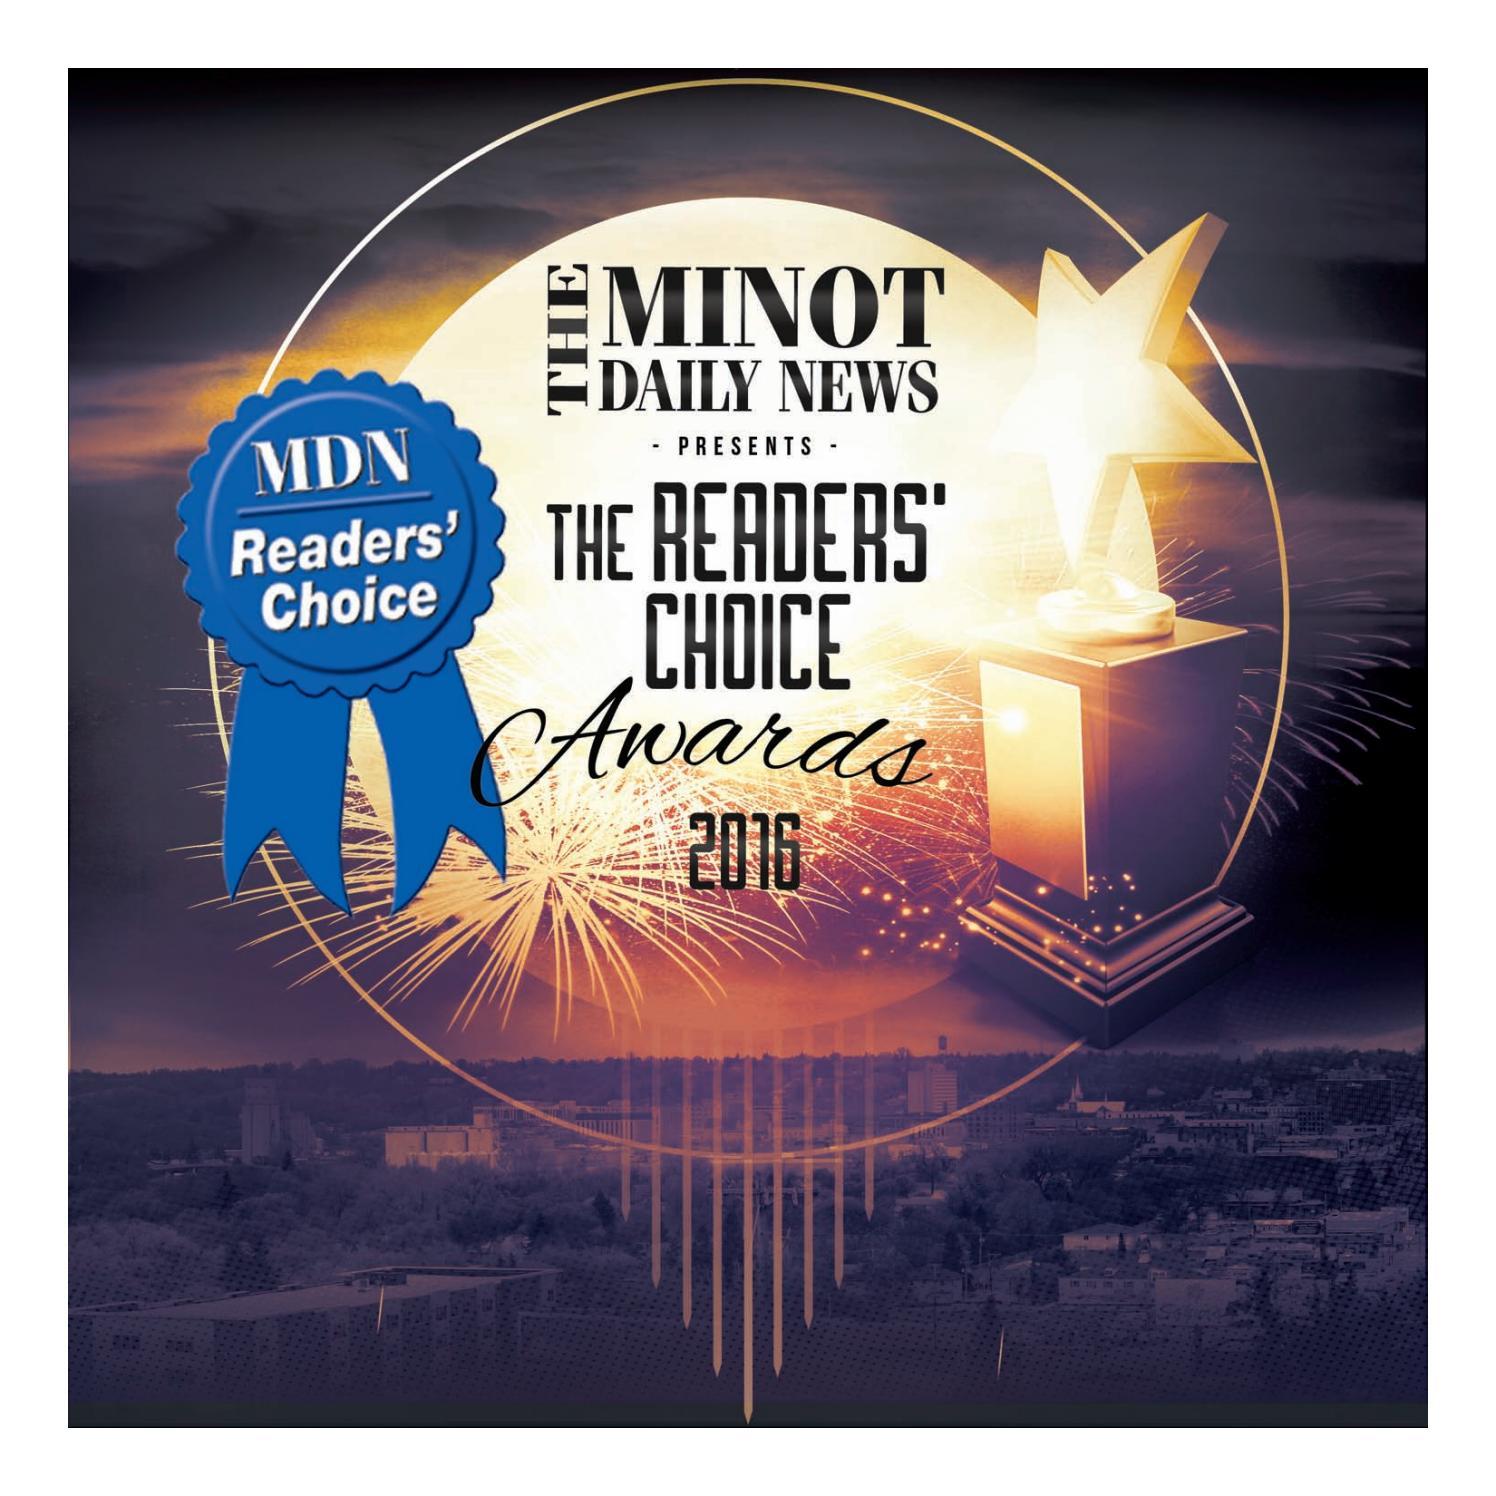 Readers Choice Awards 2016 By Minotdailynews Issuu